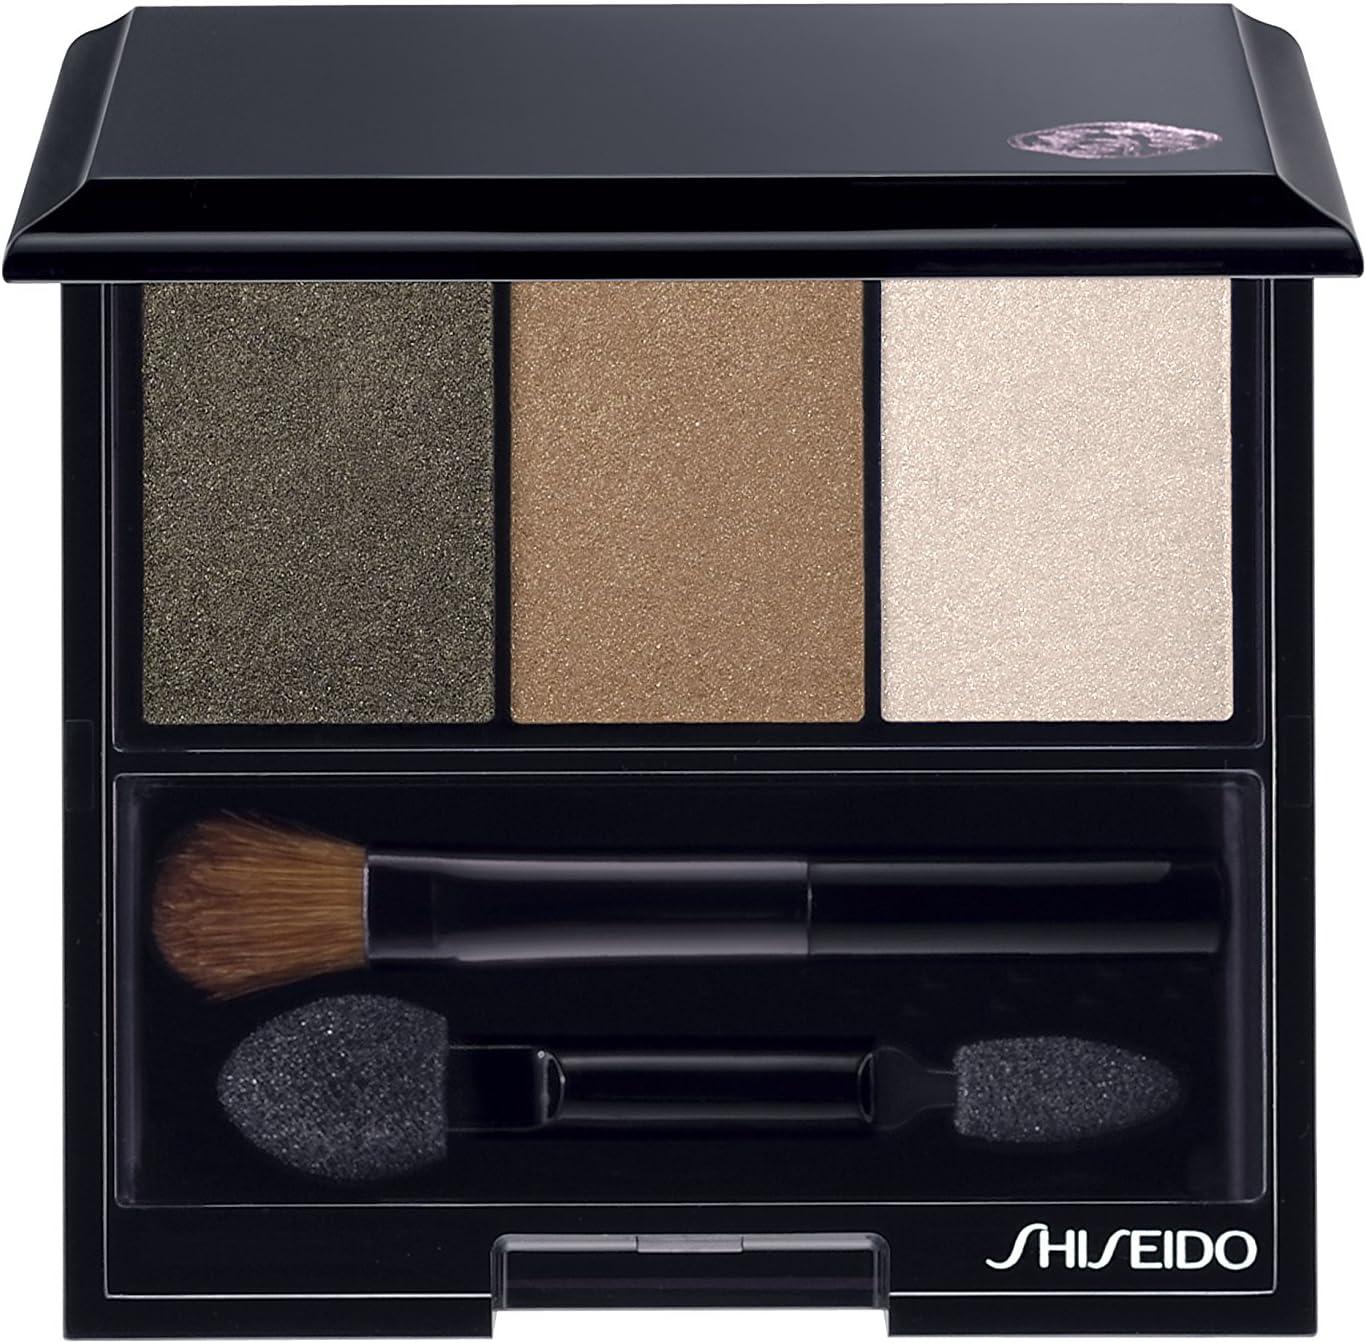 Shiseido Luminizing Satin Eye Color Trio for Women, No. BR307 Strata, 0.1 oz